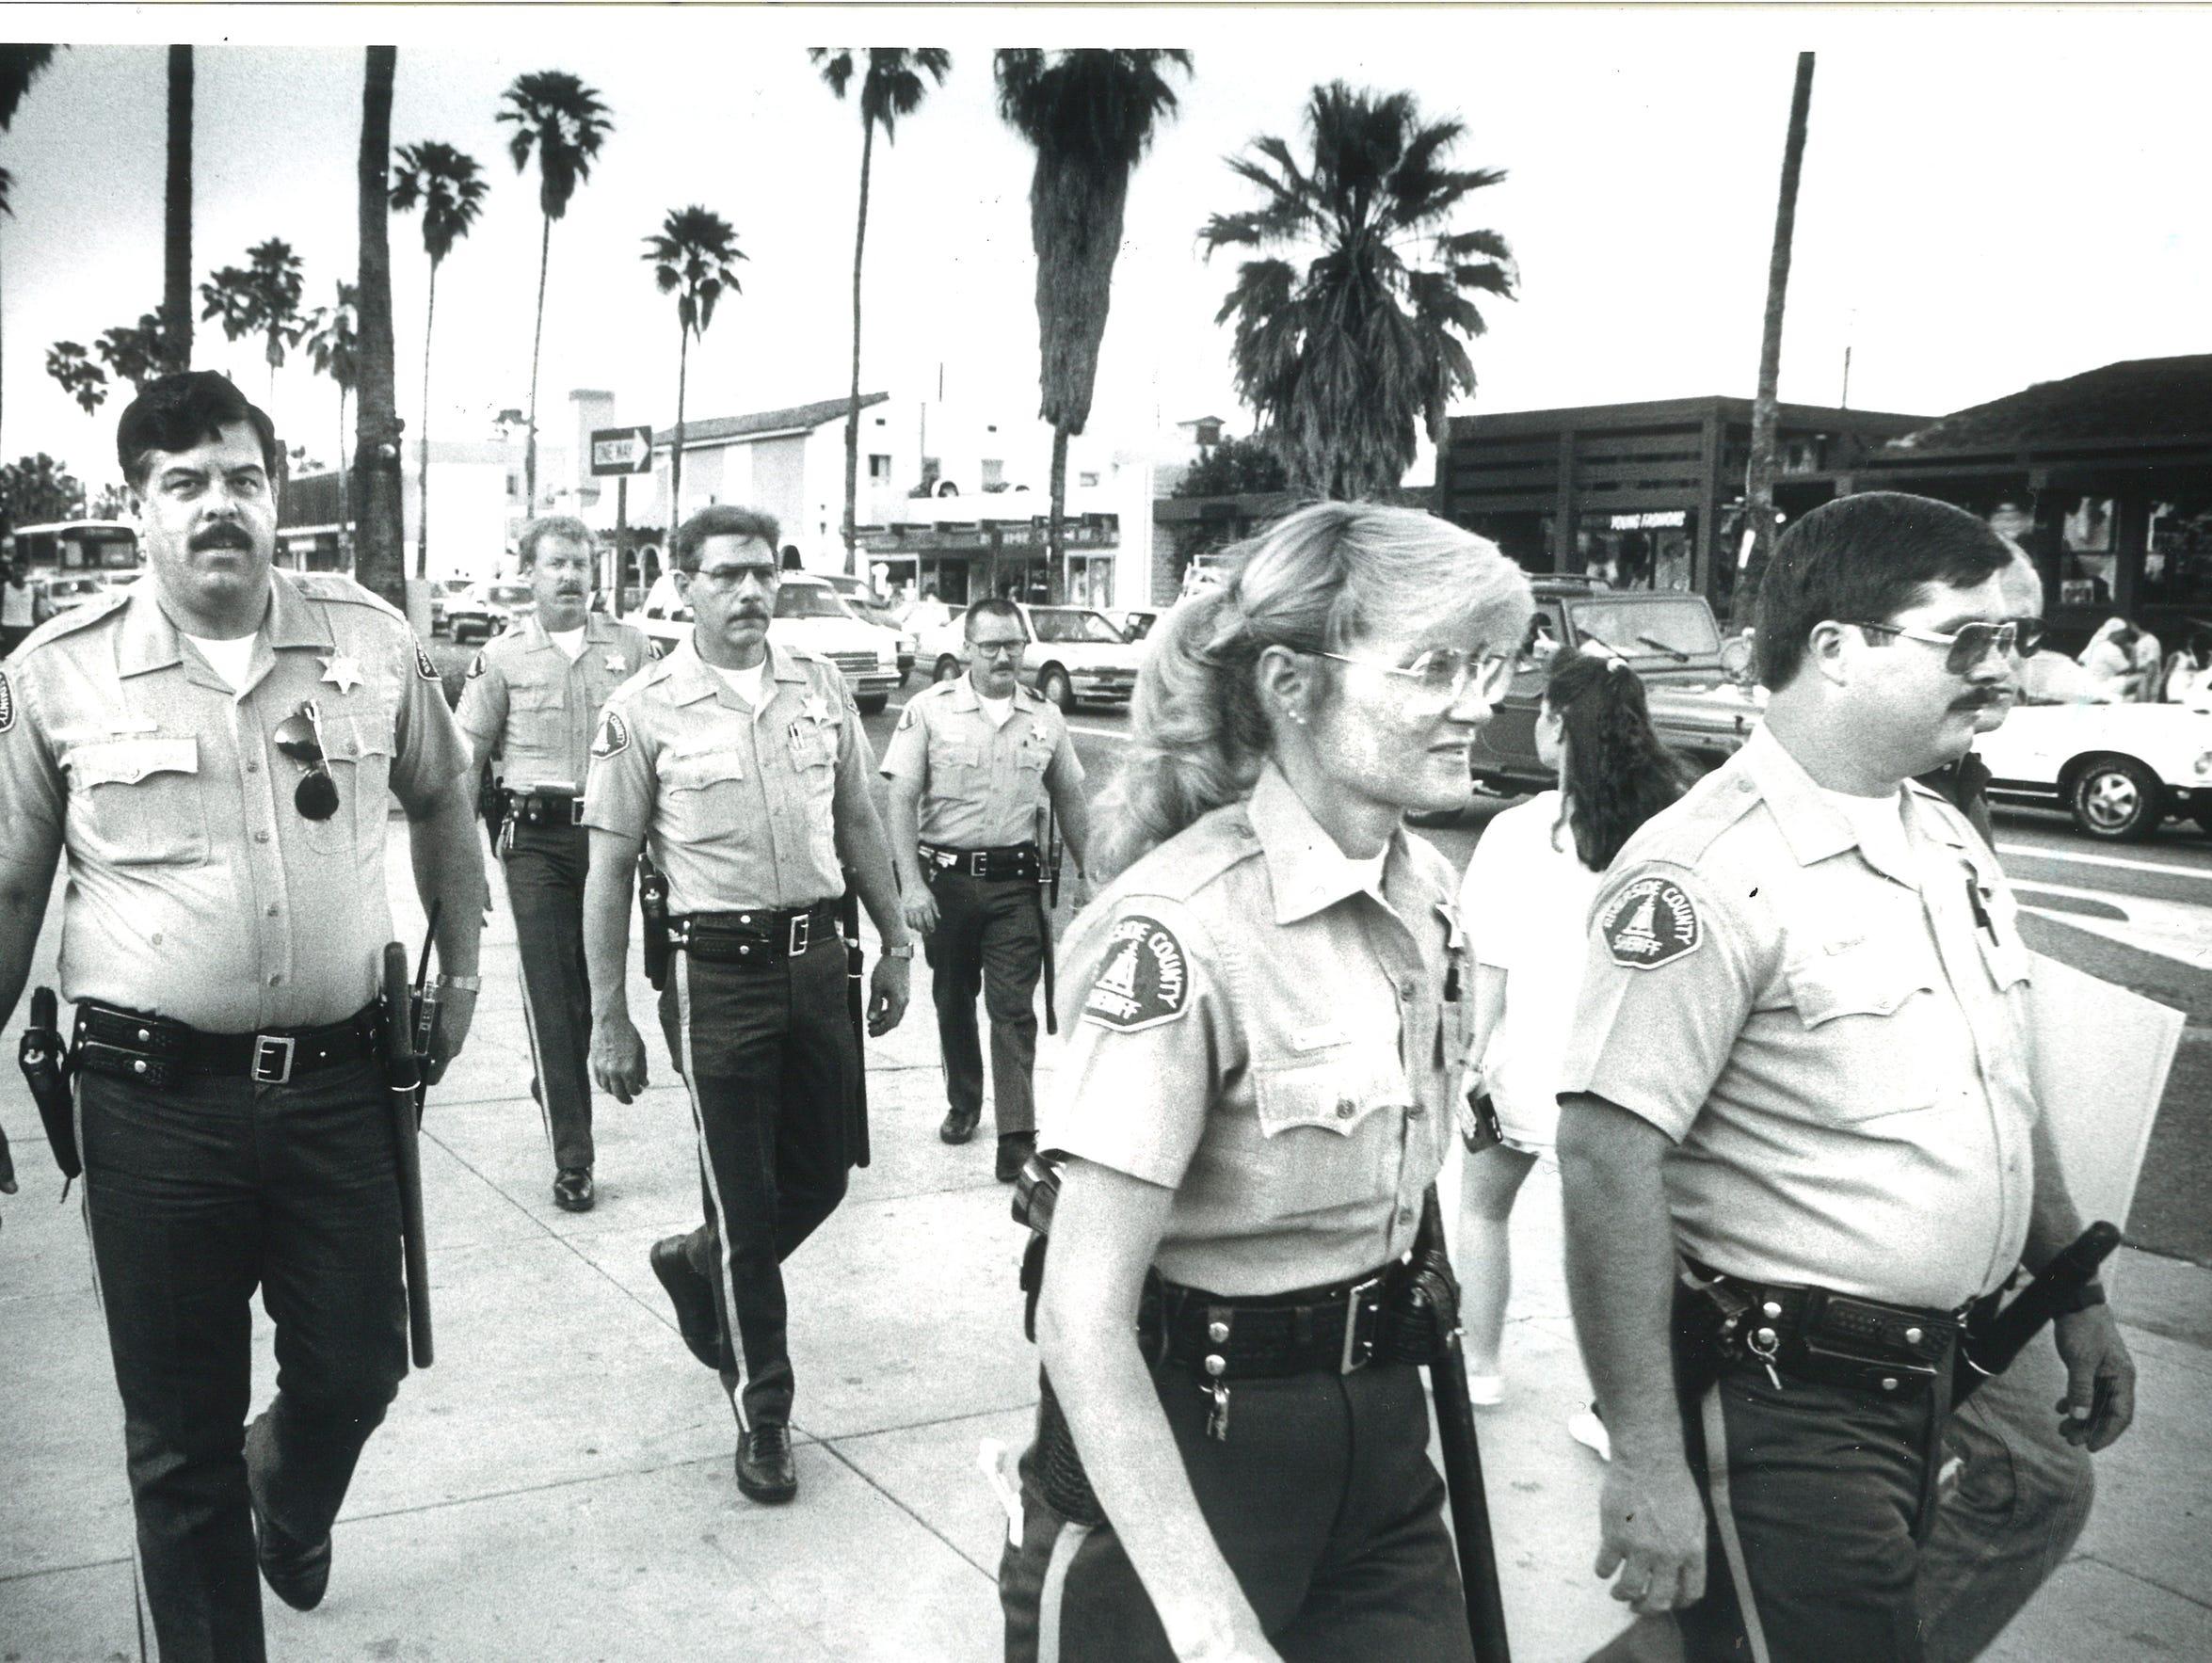 Riverside County sheriff's deputies patrol the streets